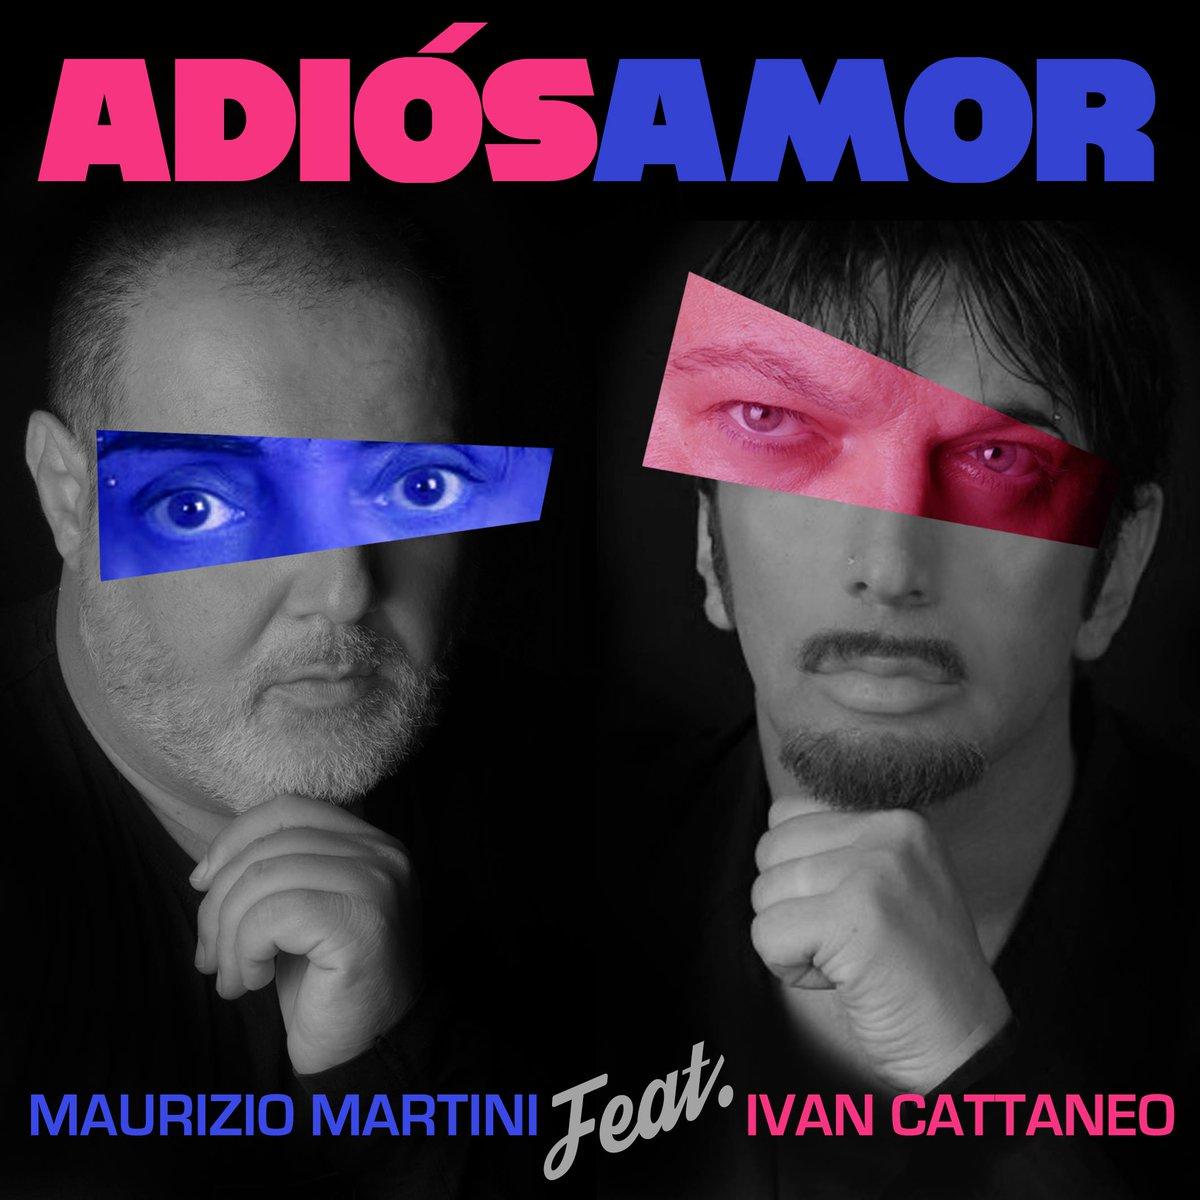 Da oggi è in #radio #AdiosAmor il nuovo singolo di #MaurizioMartini feat @ivan_cattaneo #NewSingle #OnAir#radiodate-http://radiodate.it/radio-date/maurizio-martini-feat-ivan-cattaneo-adios-amor-178334-24-09-2018-radiodate/#NewMusic  - Ukustom